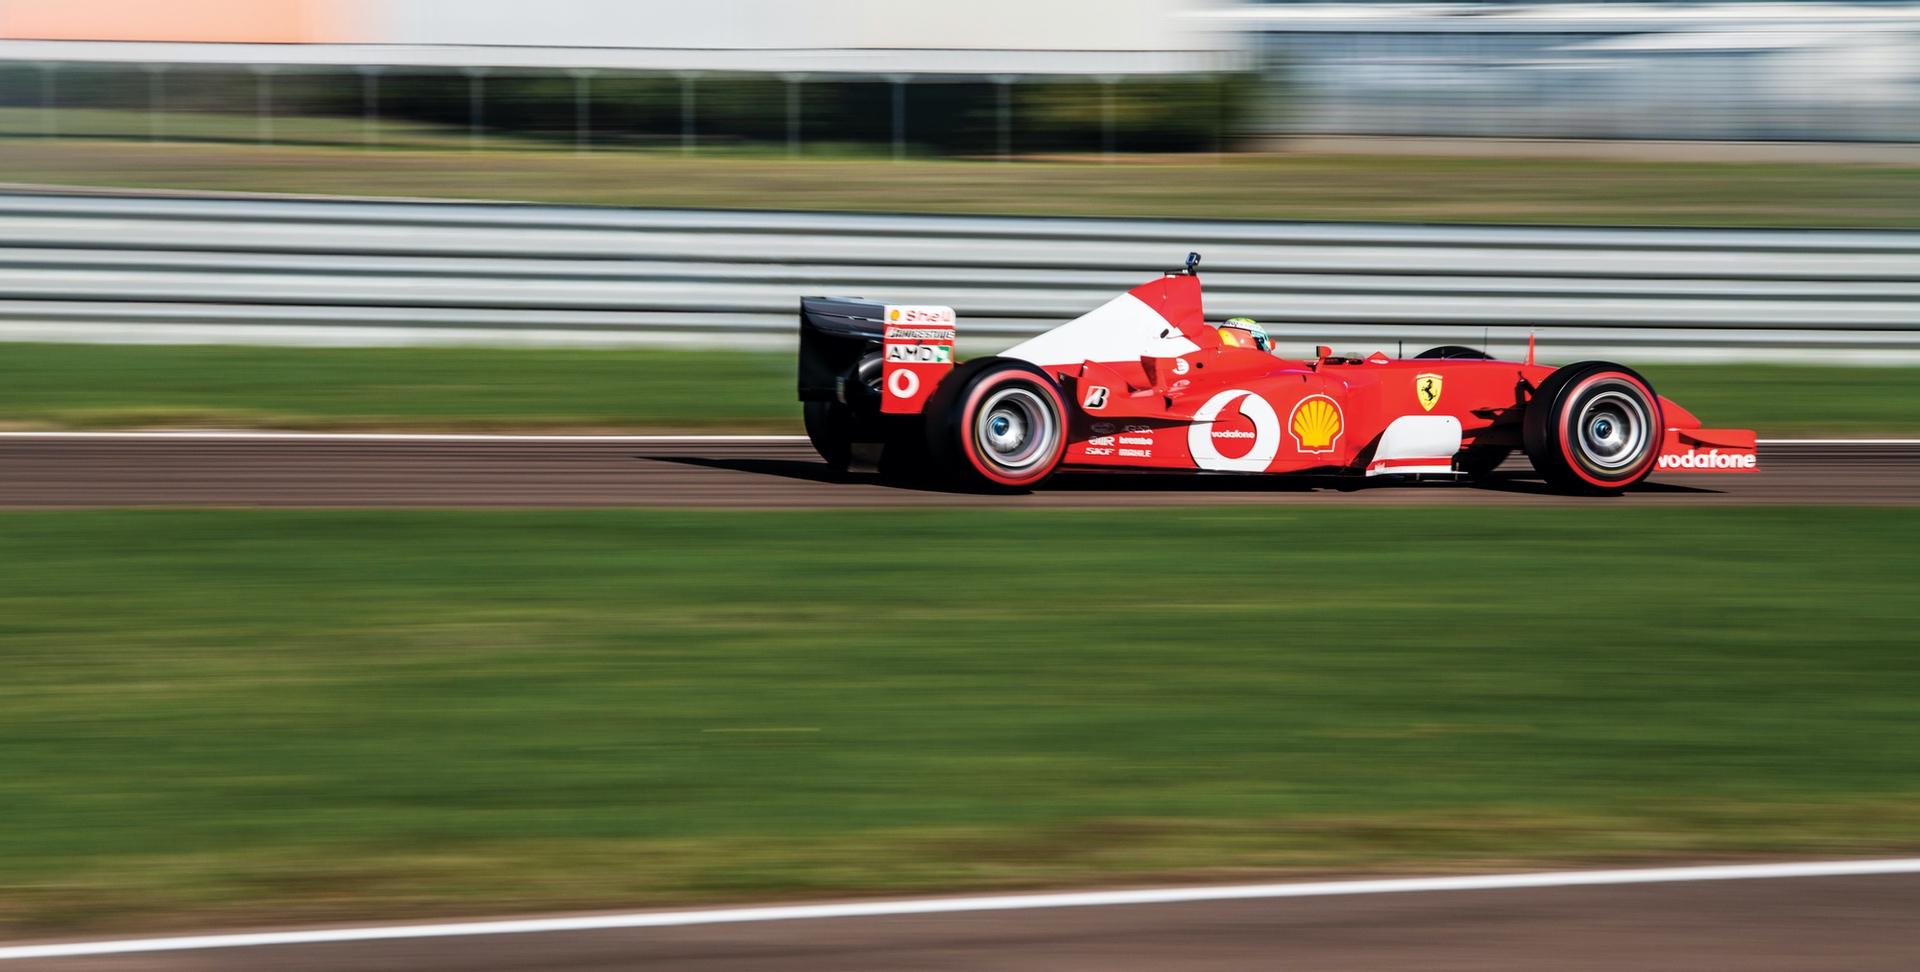 Mick_Schumacher_Ferrari_F2002_0036